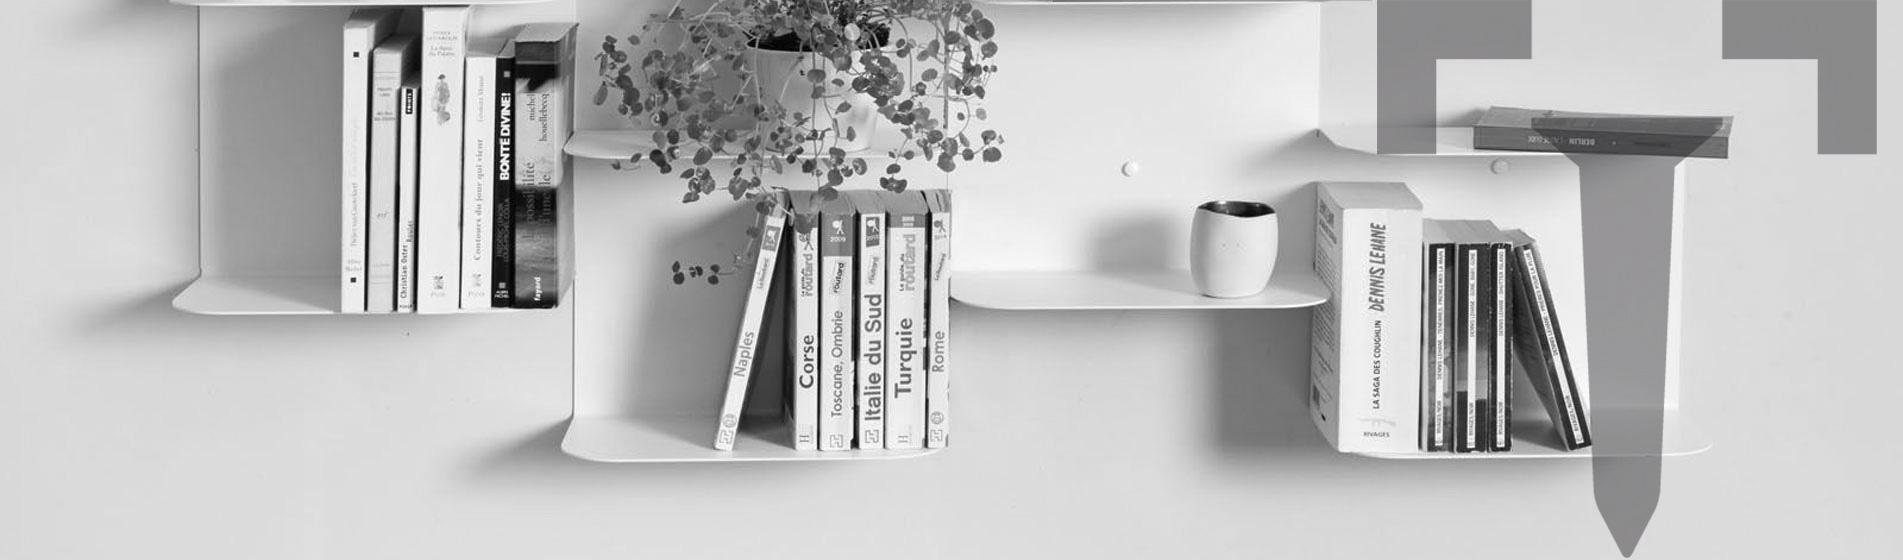 achat petite tag re murale troite paris teebooks. Black Bedroom Furniture Sets. Home Design Ideas